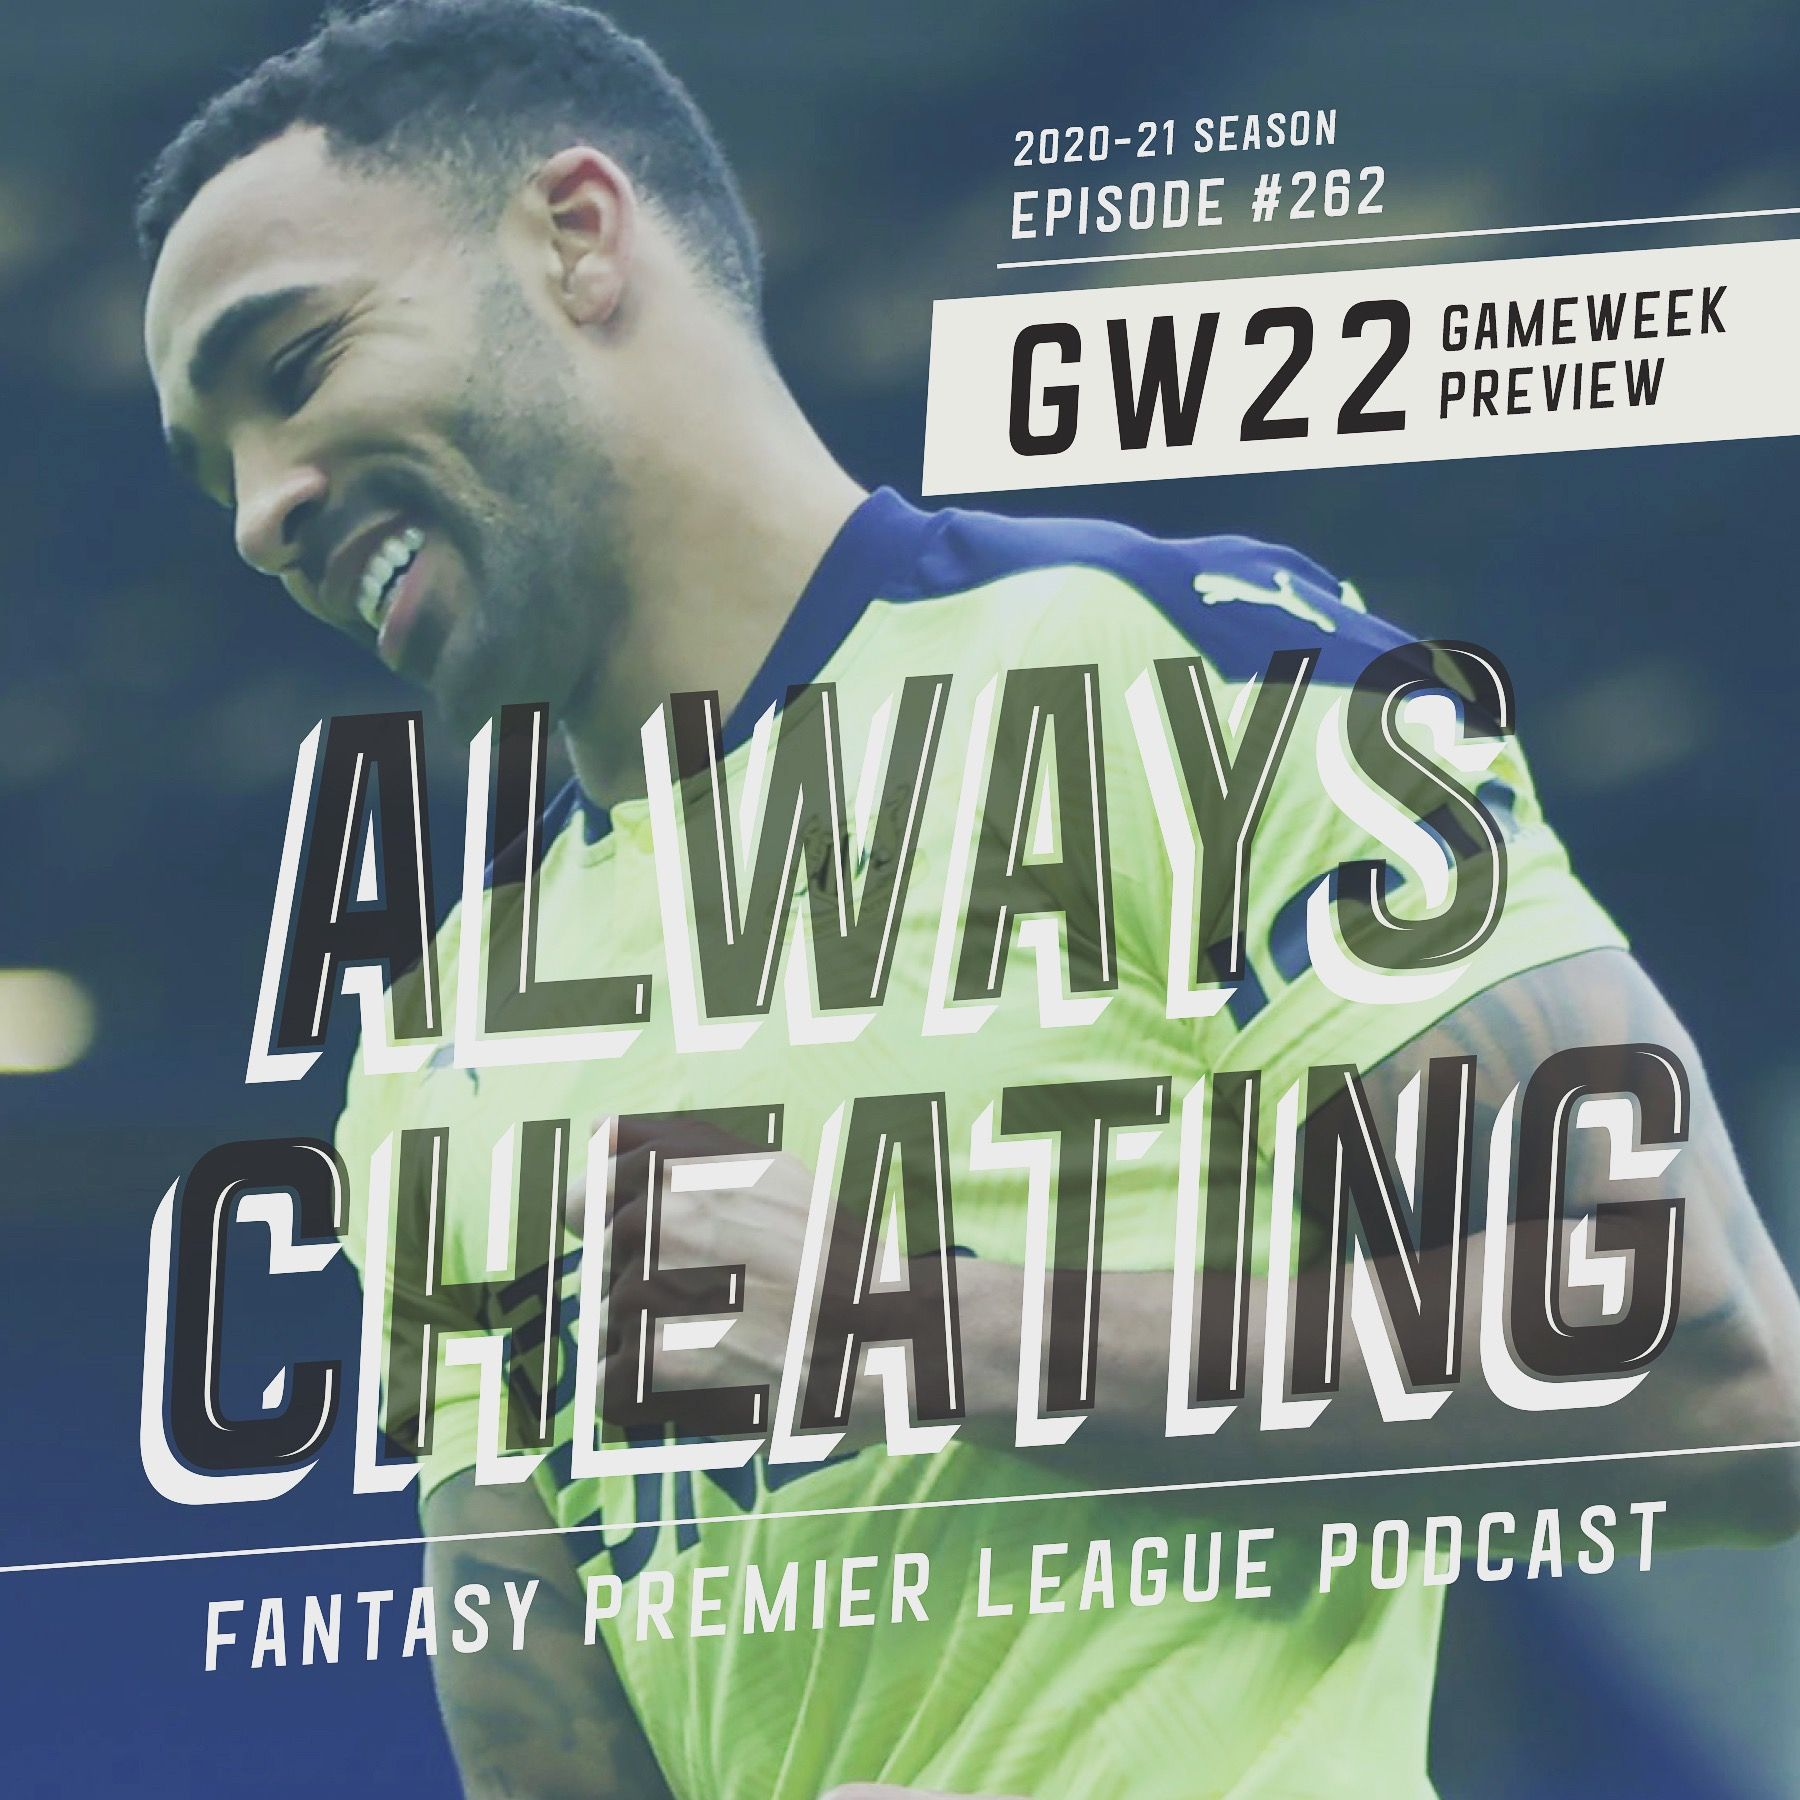 GW22 Preview & Favorite FPL Moments